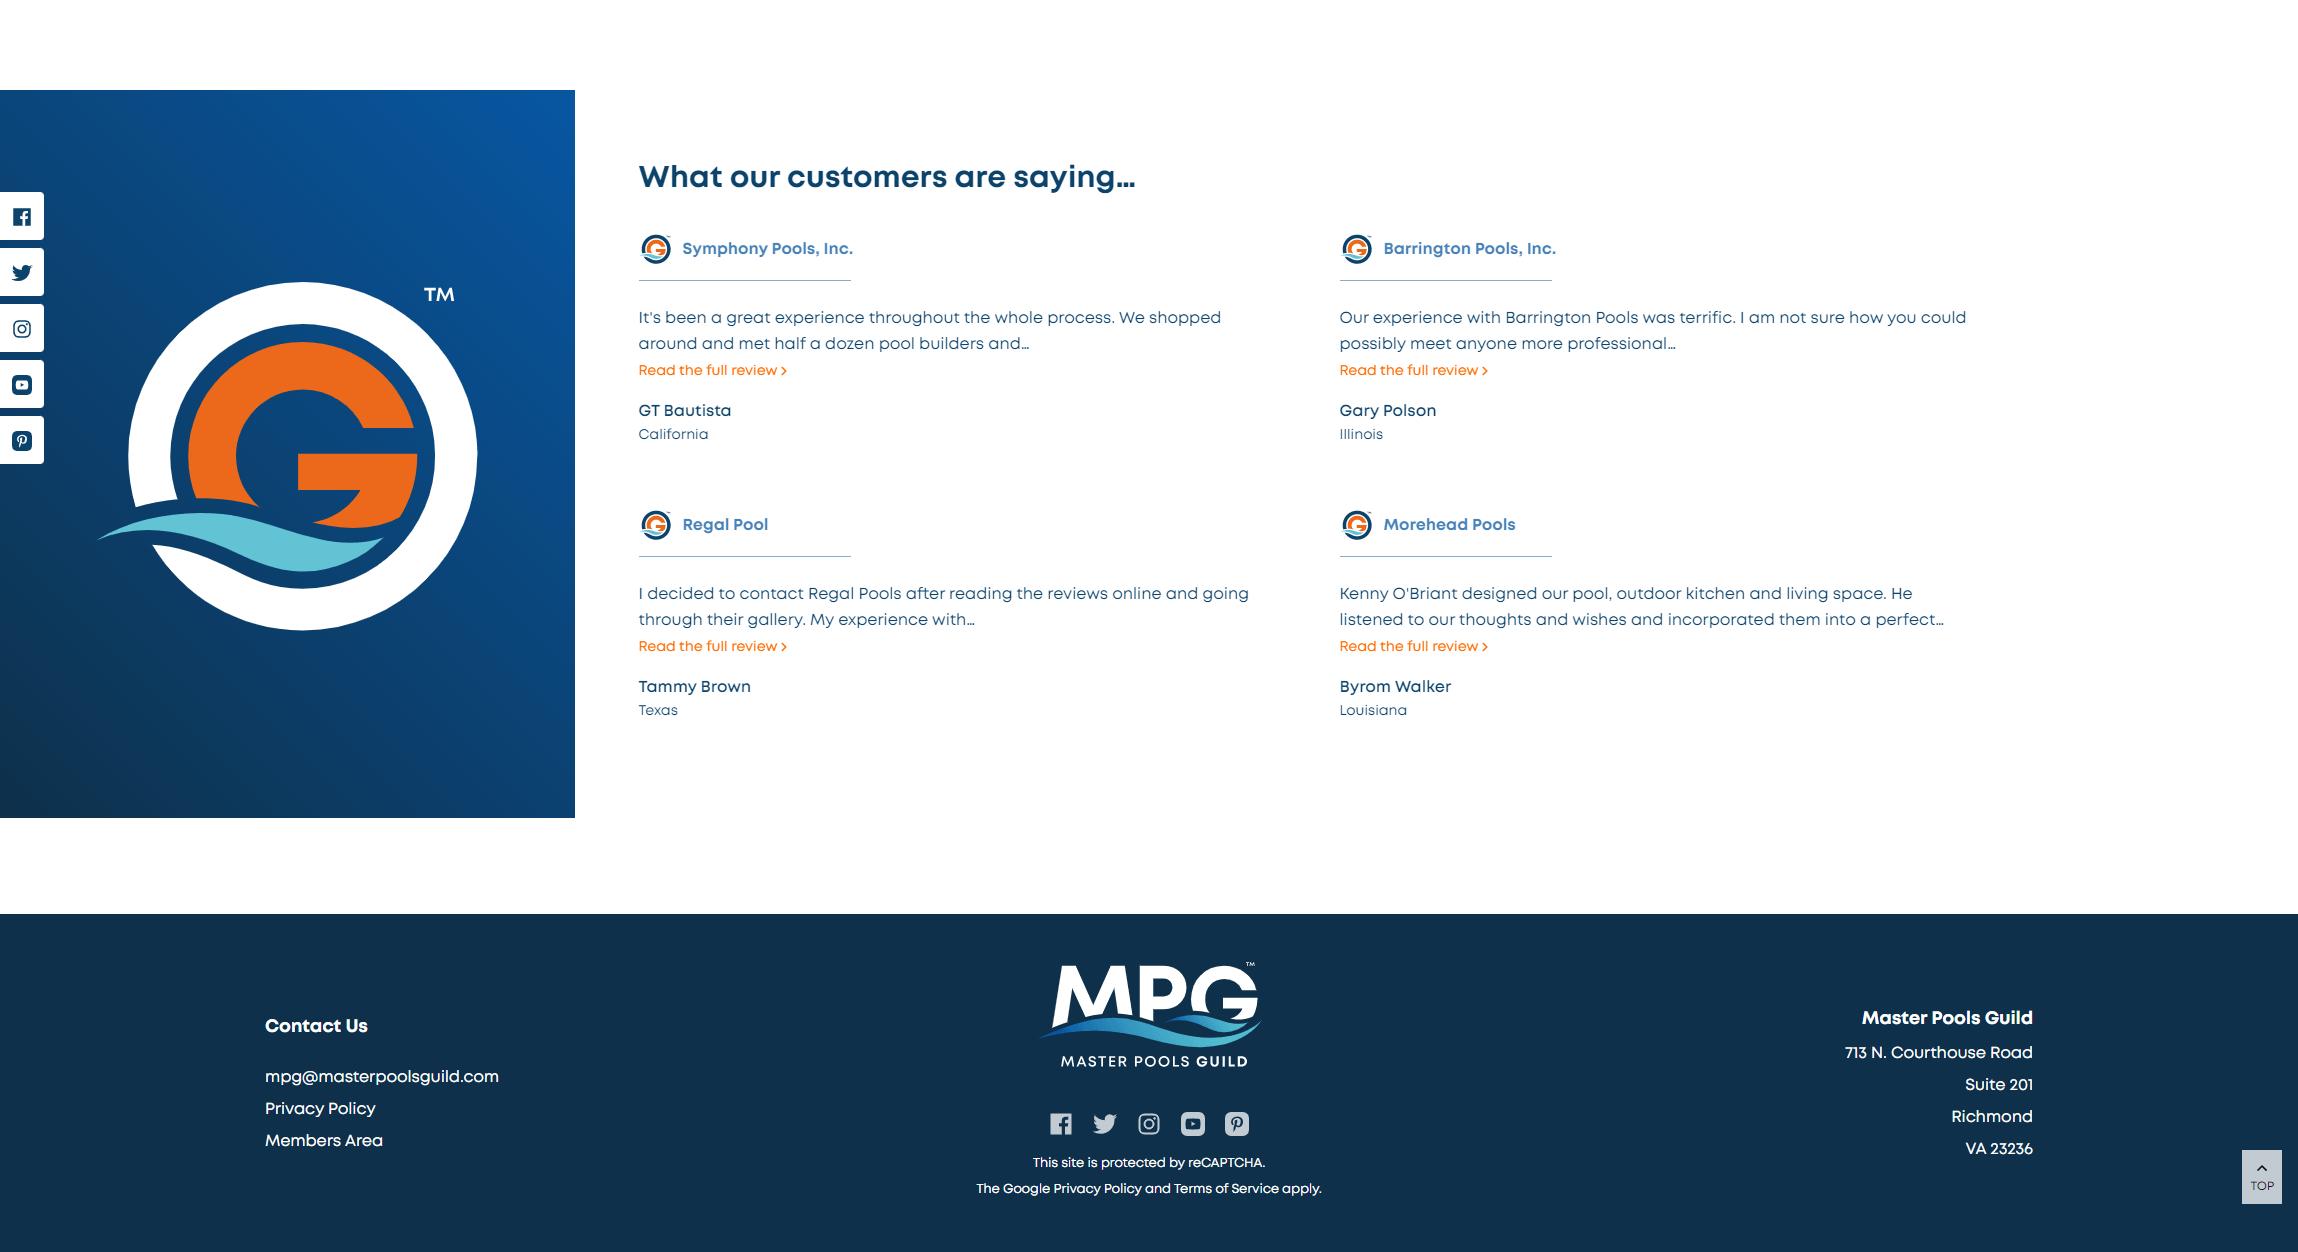 www.masterpoolsguild.com-3